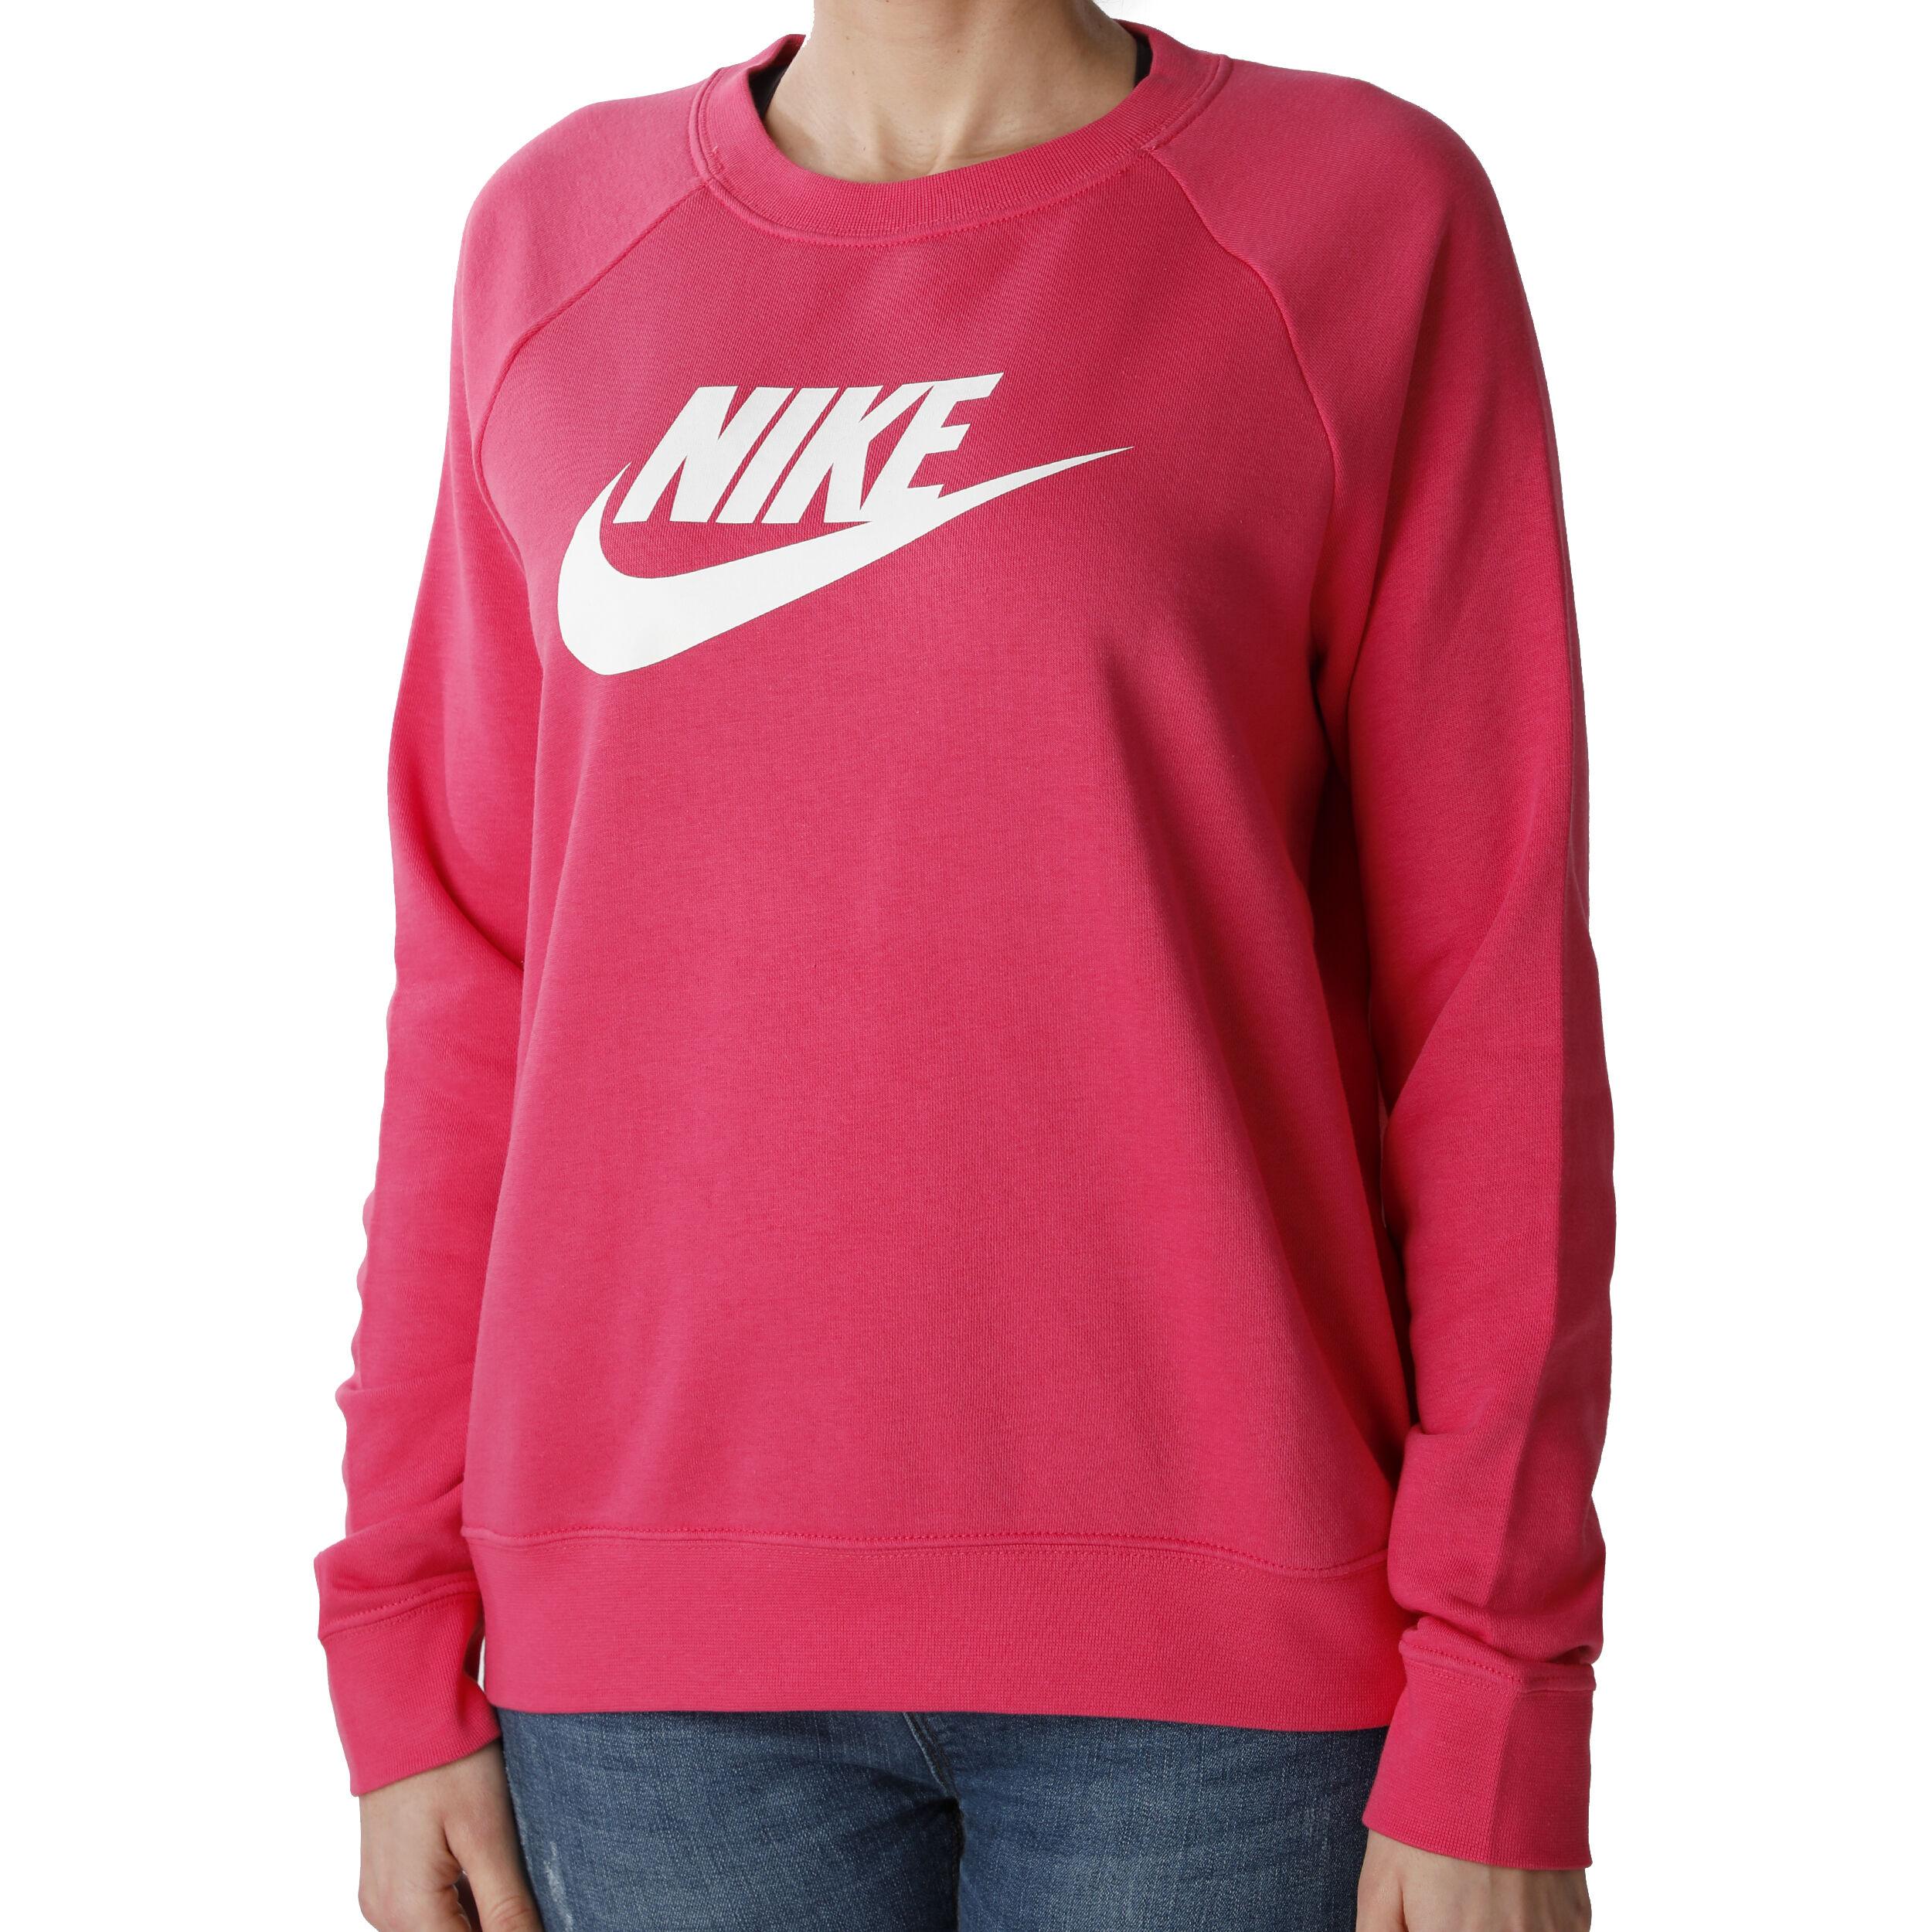 Nike Sportswear Essential Crew Sweatshirt Damen Pink, Weiß